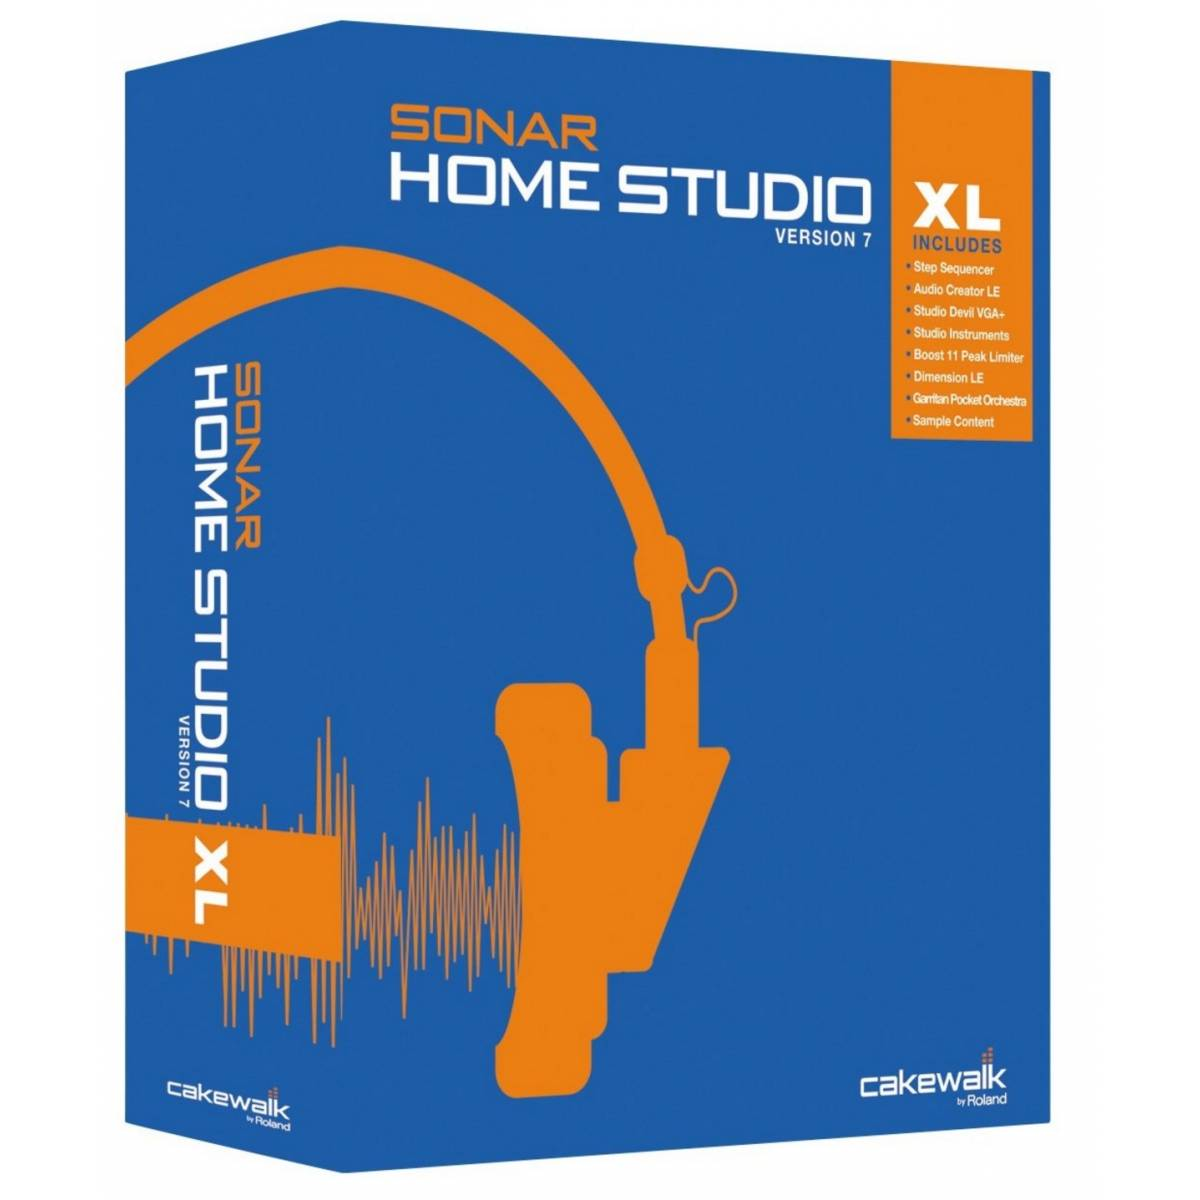 cakewalk sonar home studio 7 xl student teacher recording software from inta audio uk. Black Bedroom Furniture Sets. Home Design Ideas